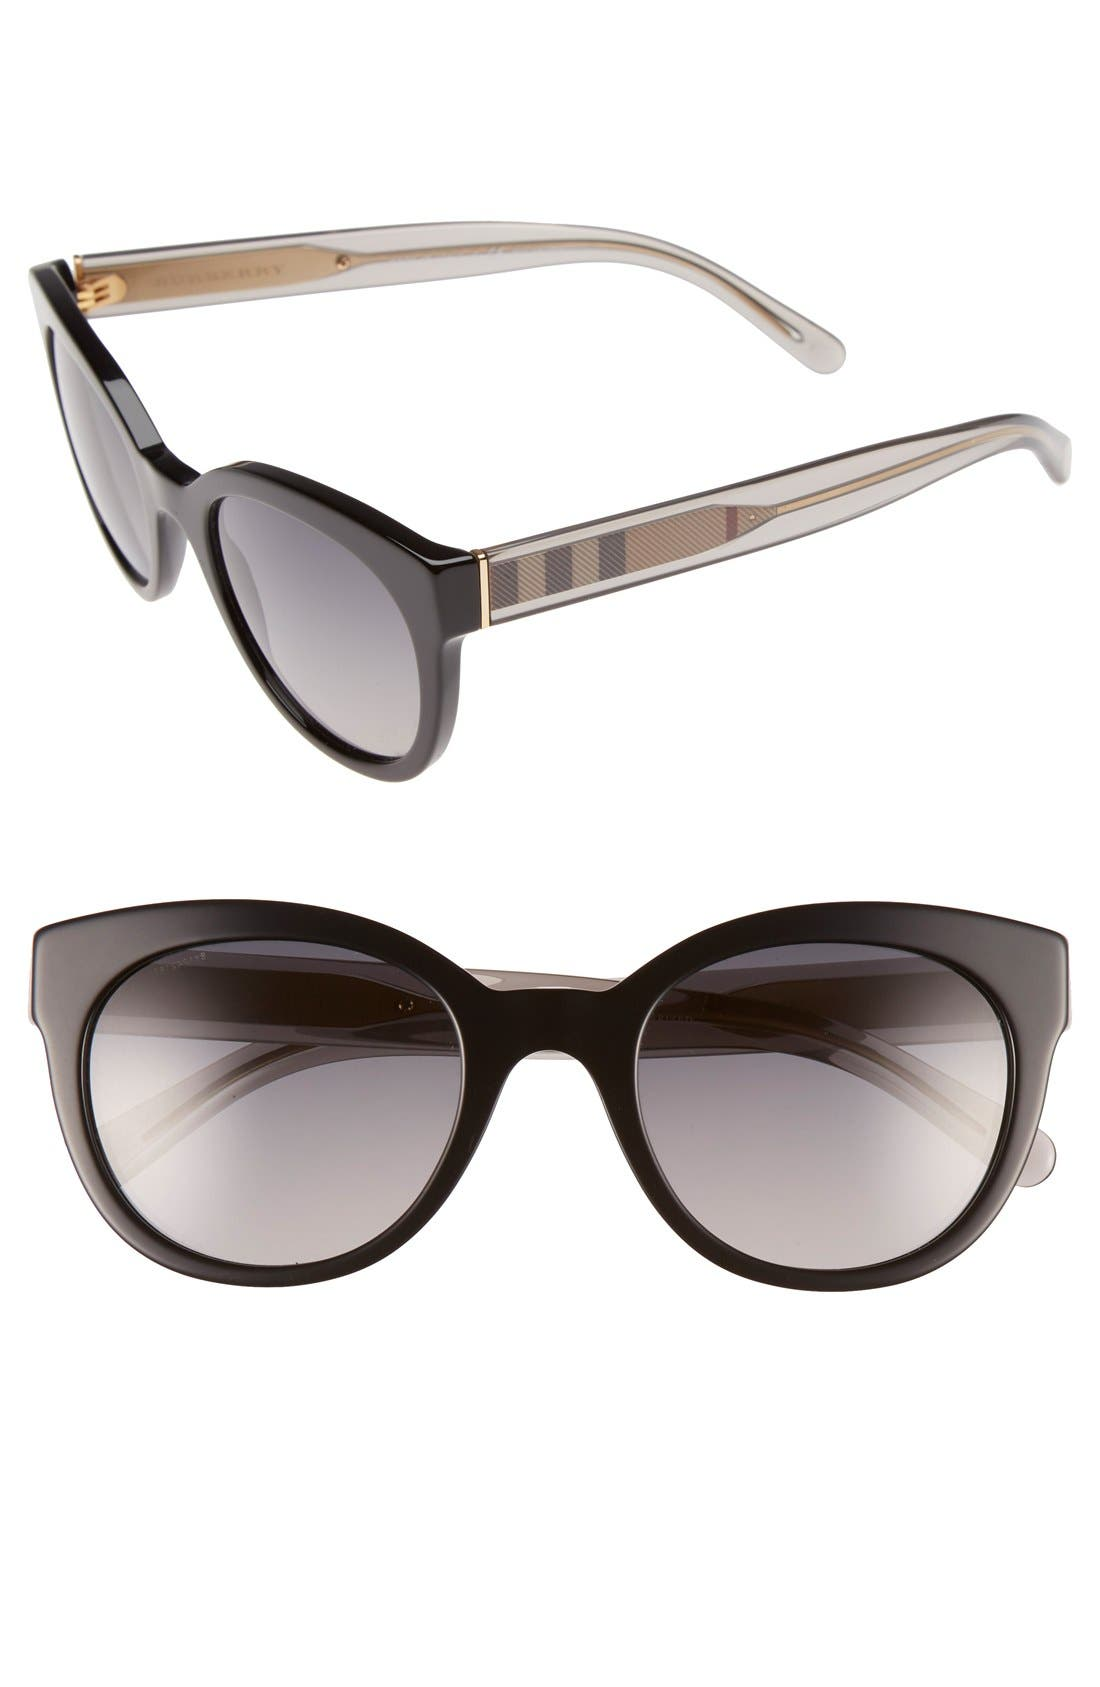 Alternate Image 1 Selected - Burberry 52mm Polarized Retro Sunglasses